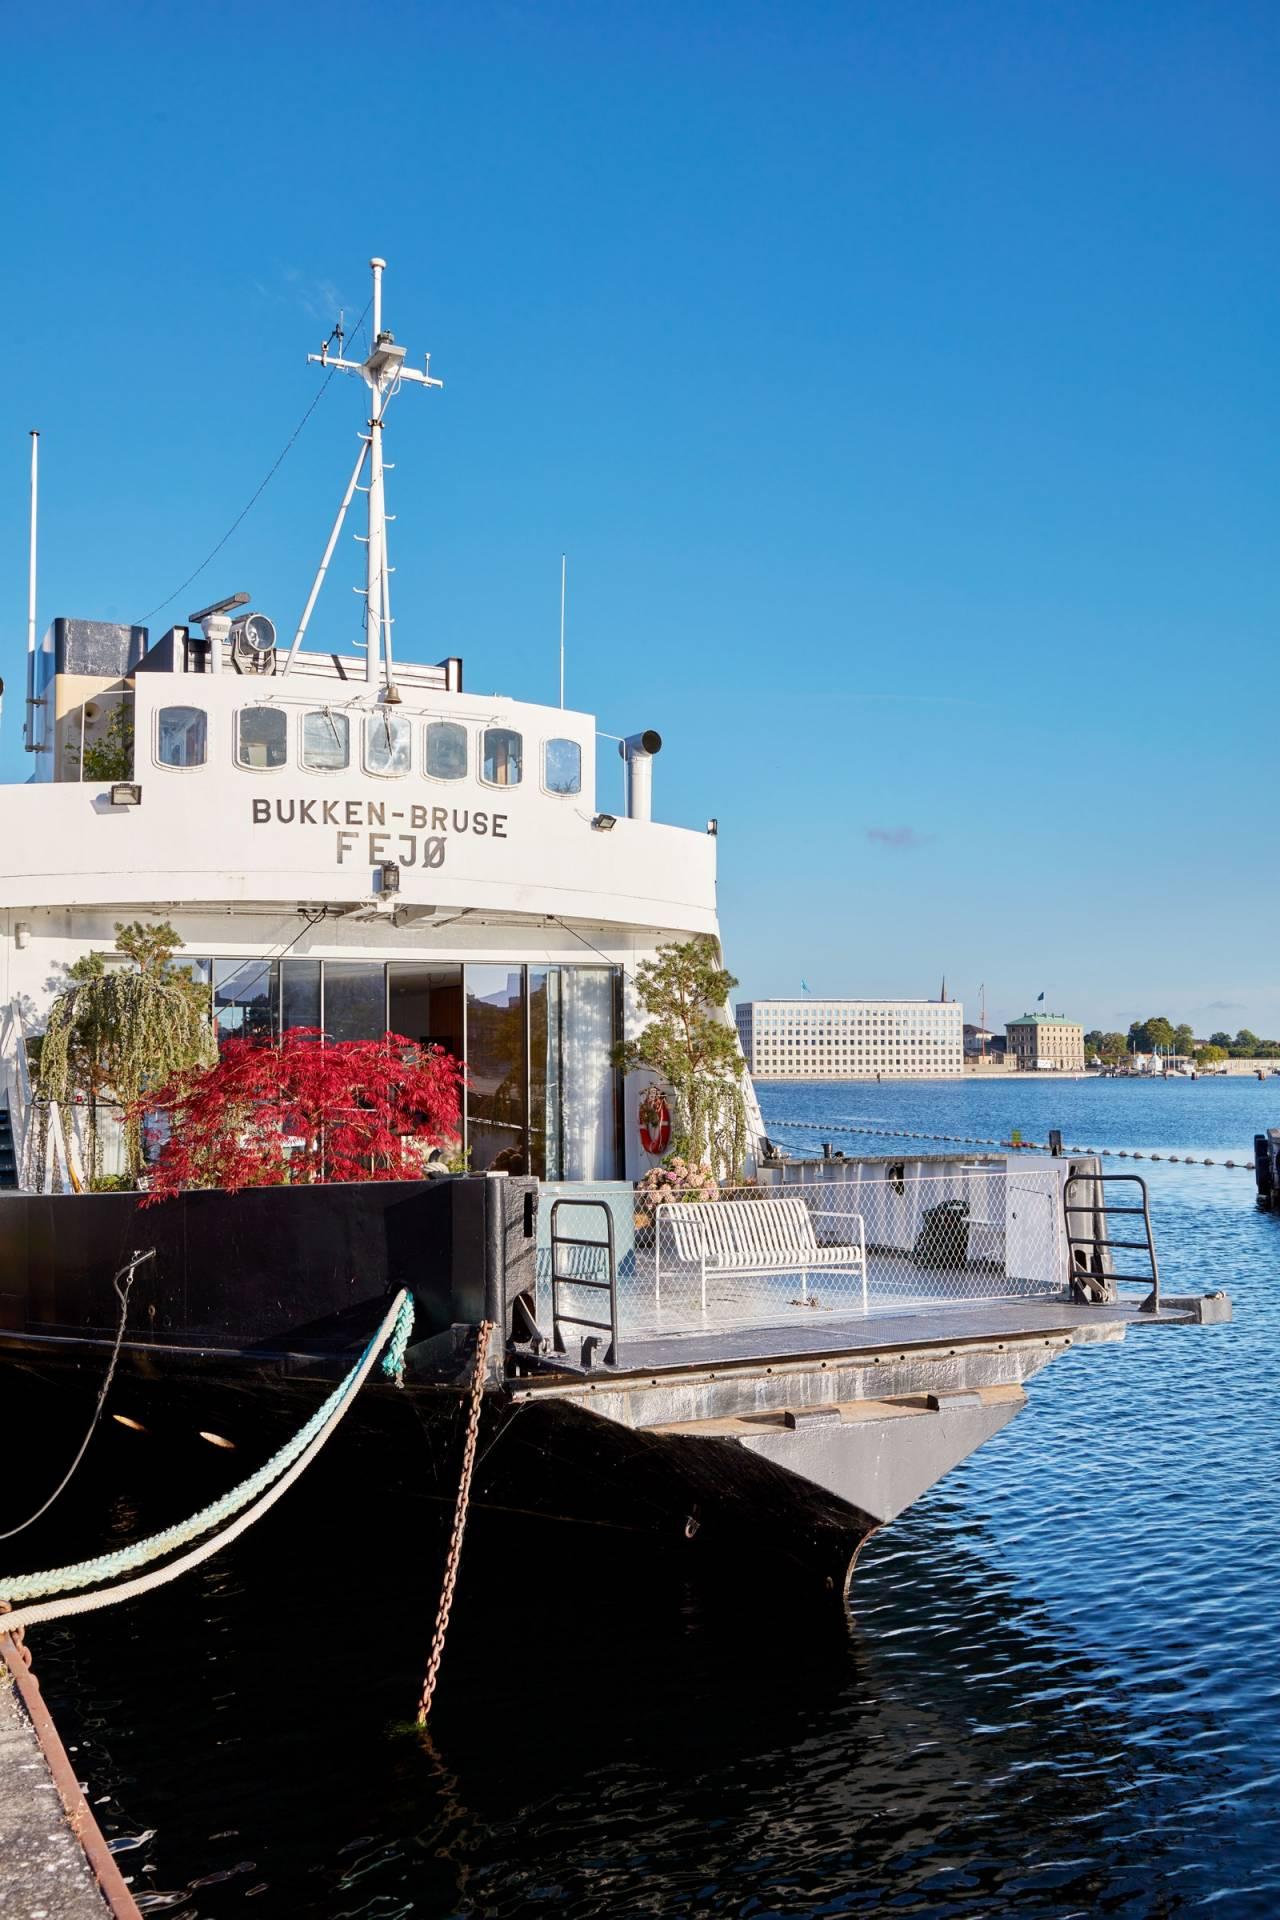 bjarke_ingels_houseboat_foto_pernille_loof_and_thomas_loof_designalive-8